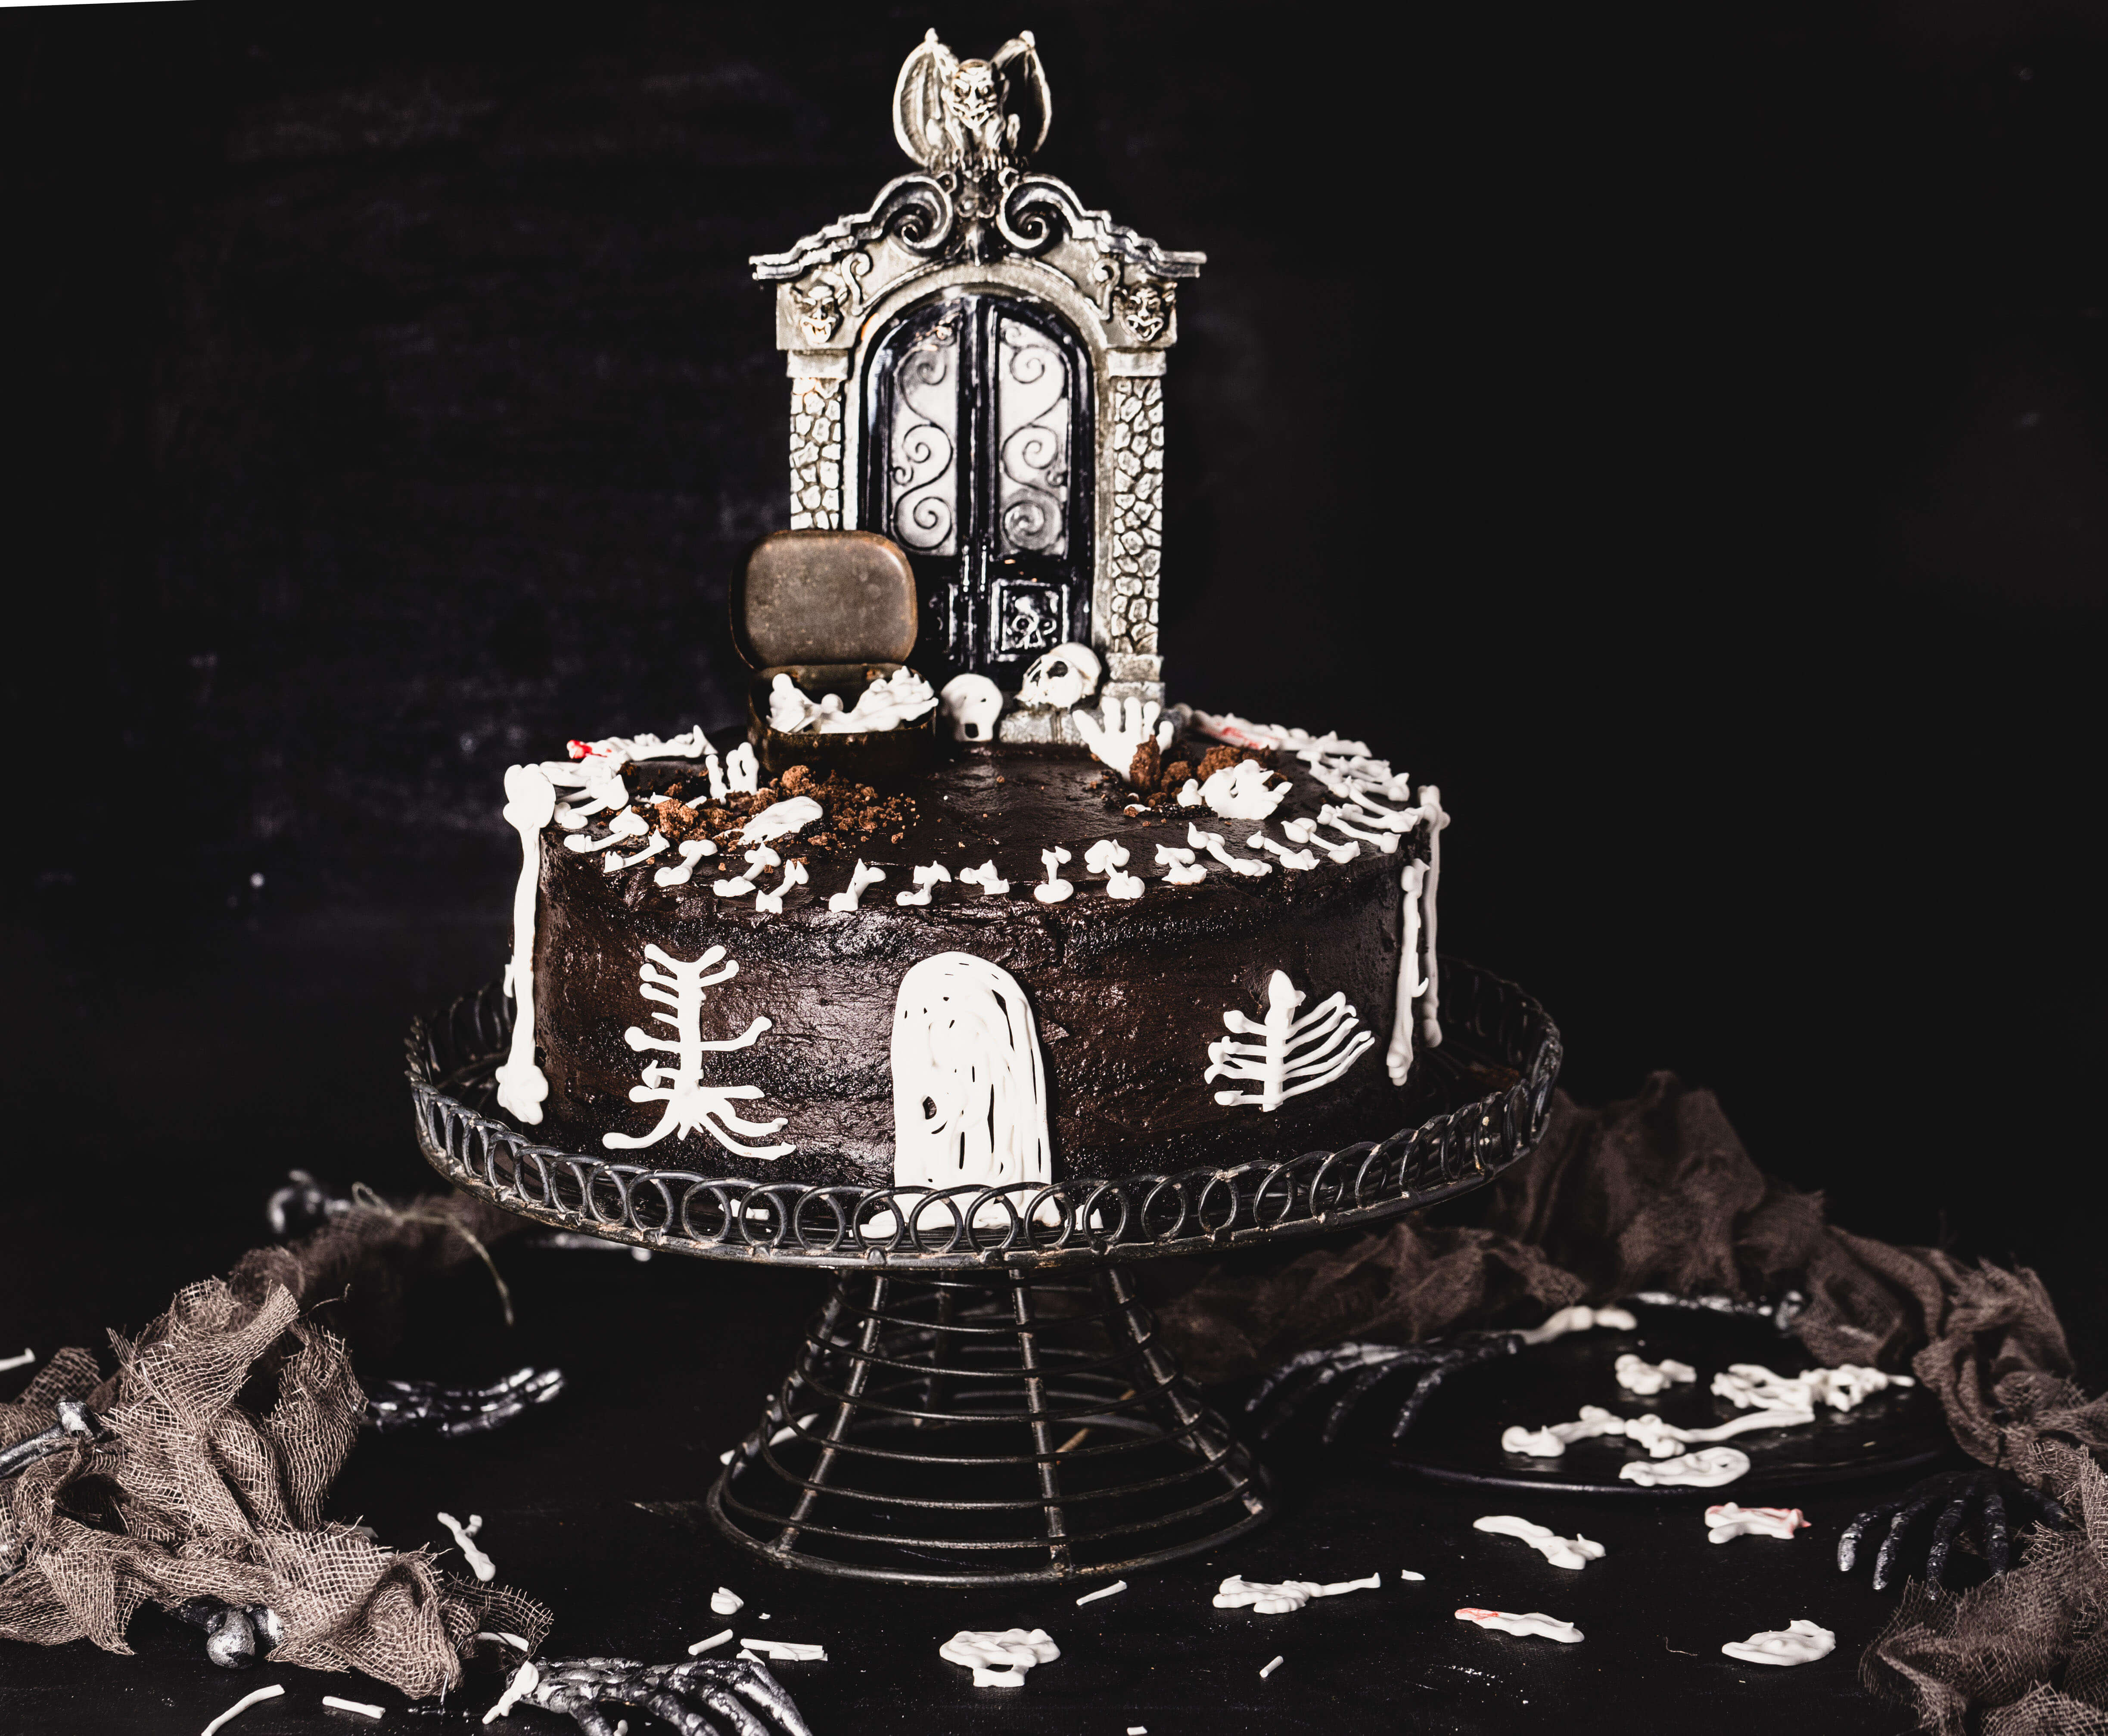 halloween murder house cake - devils food cake and fudge frosting